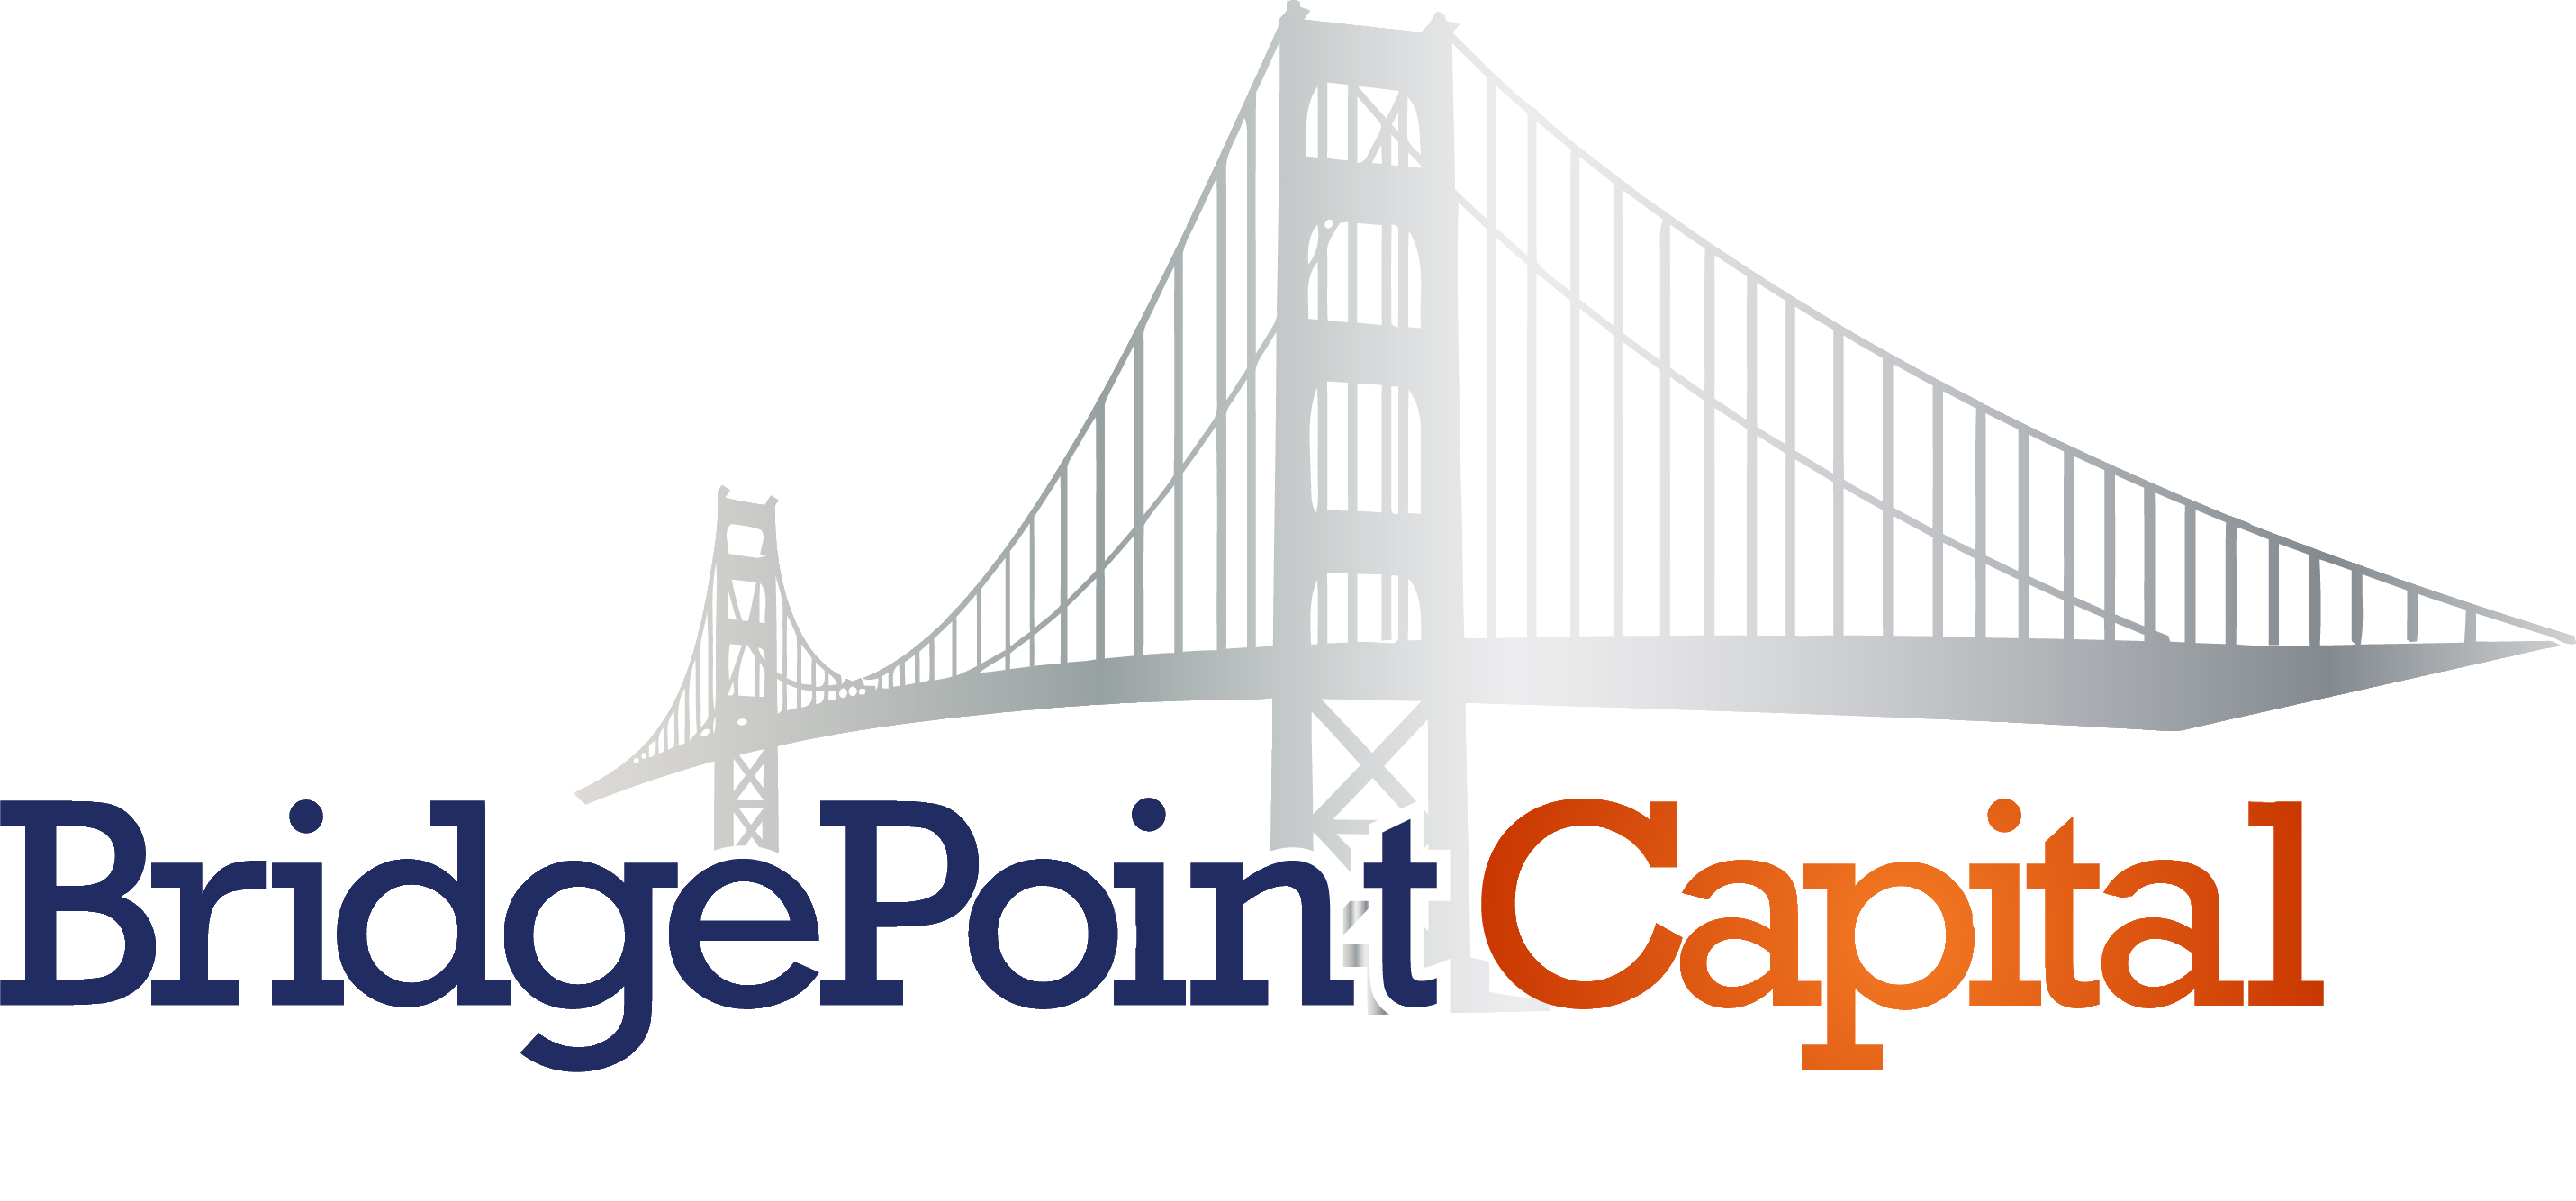 BridgePoint Capital Group.